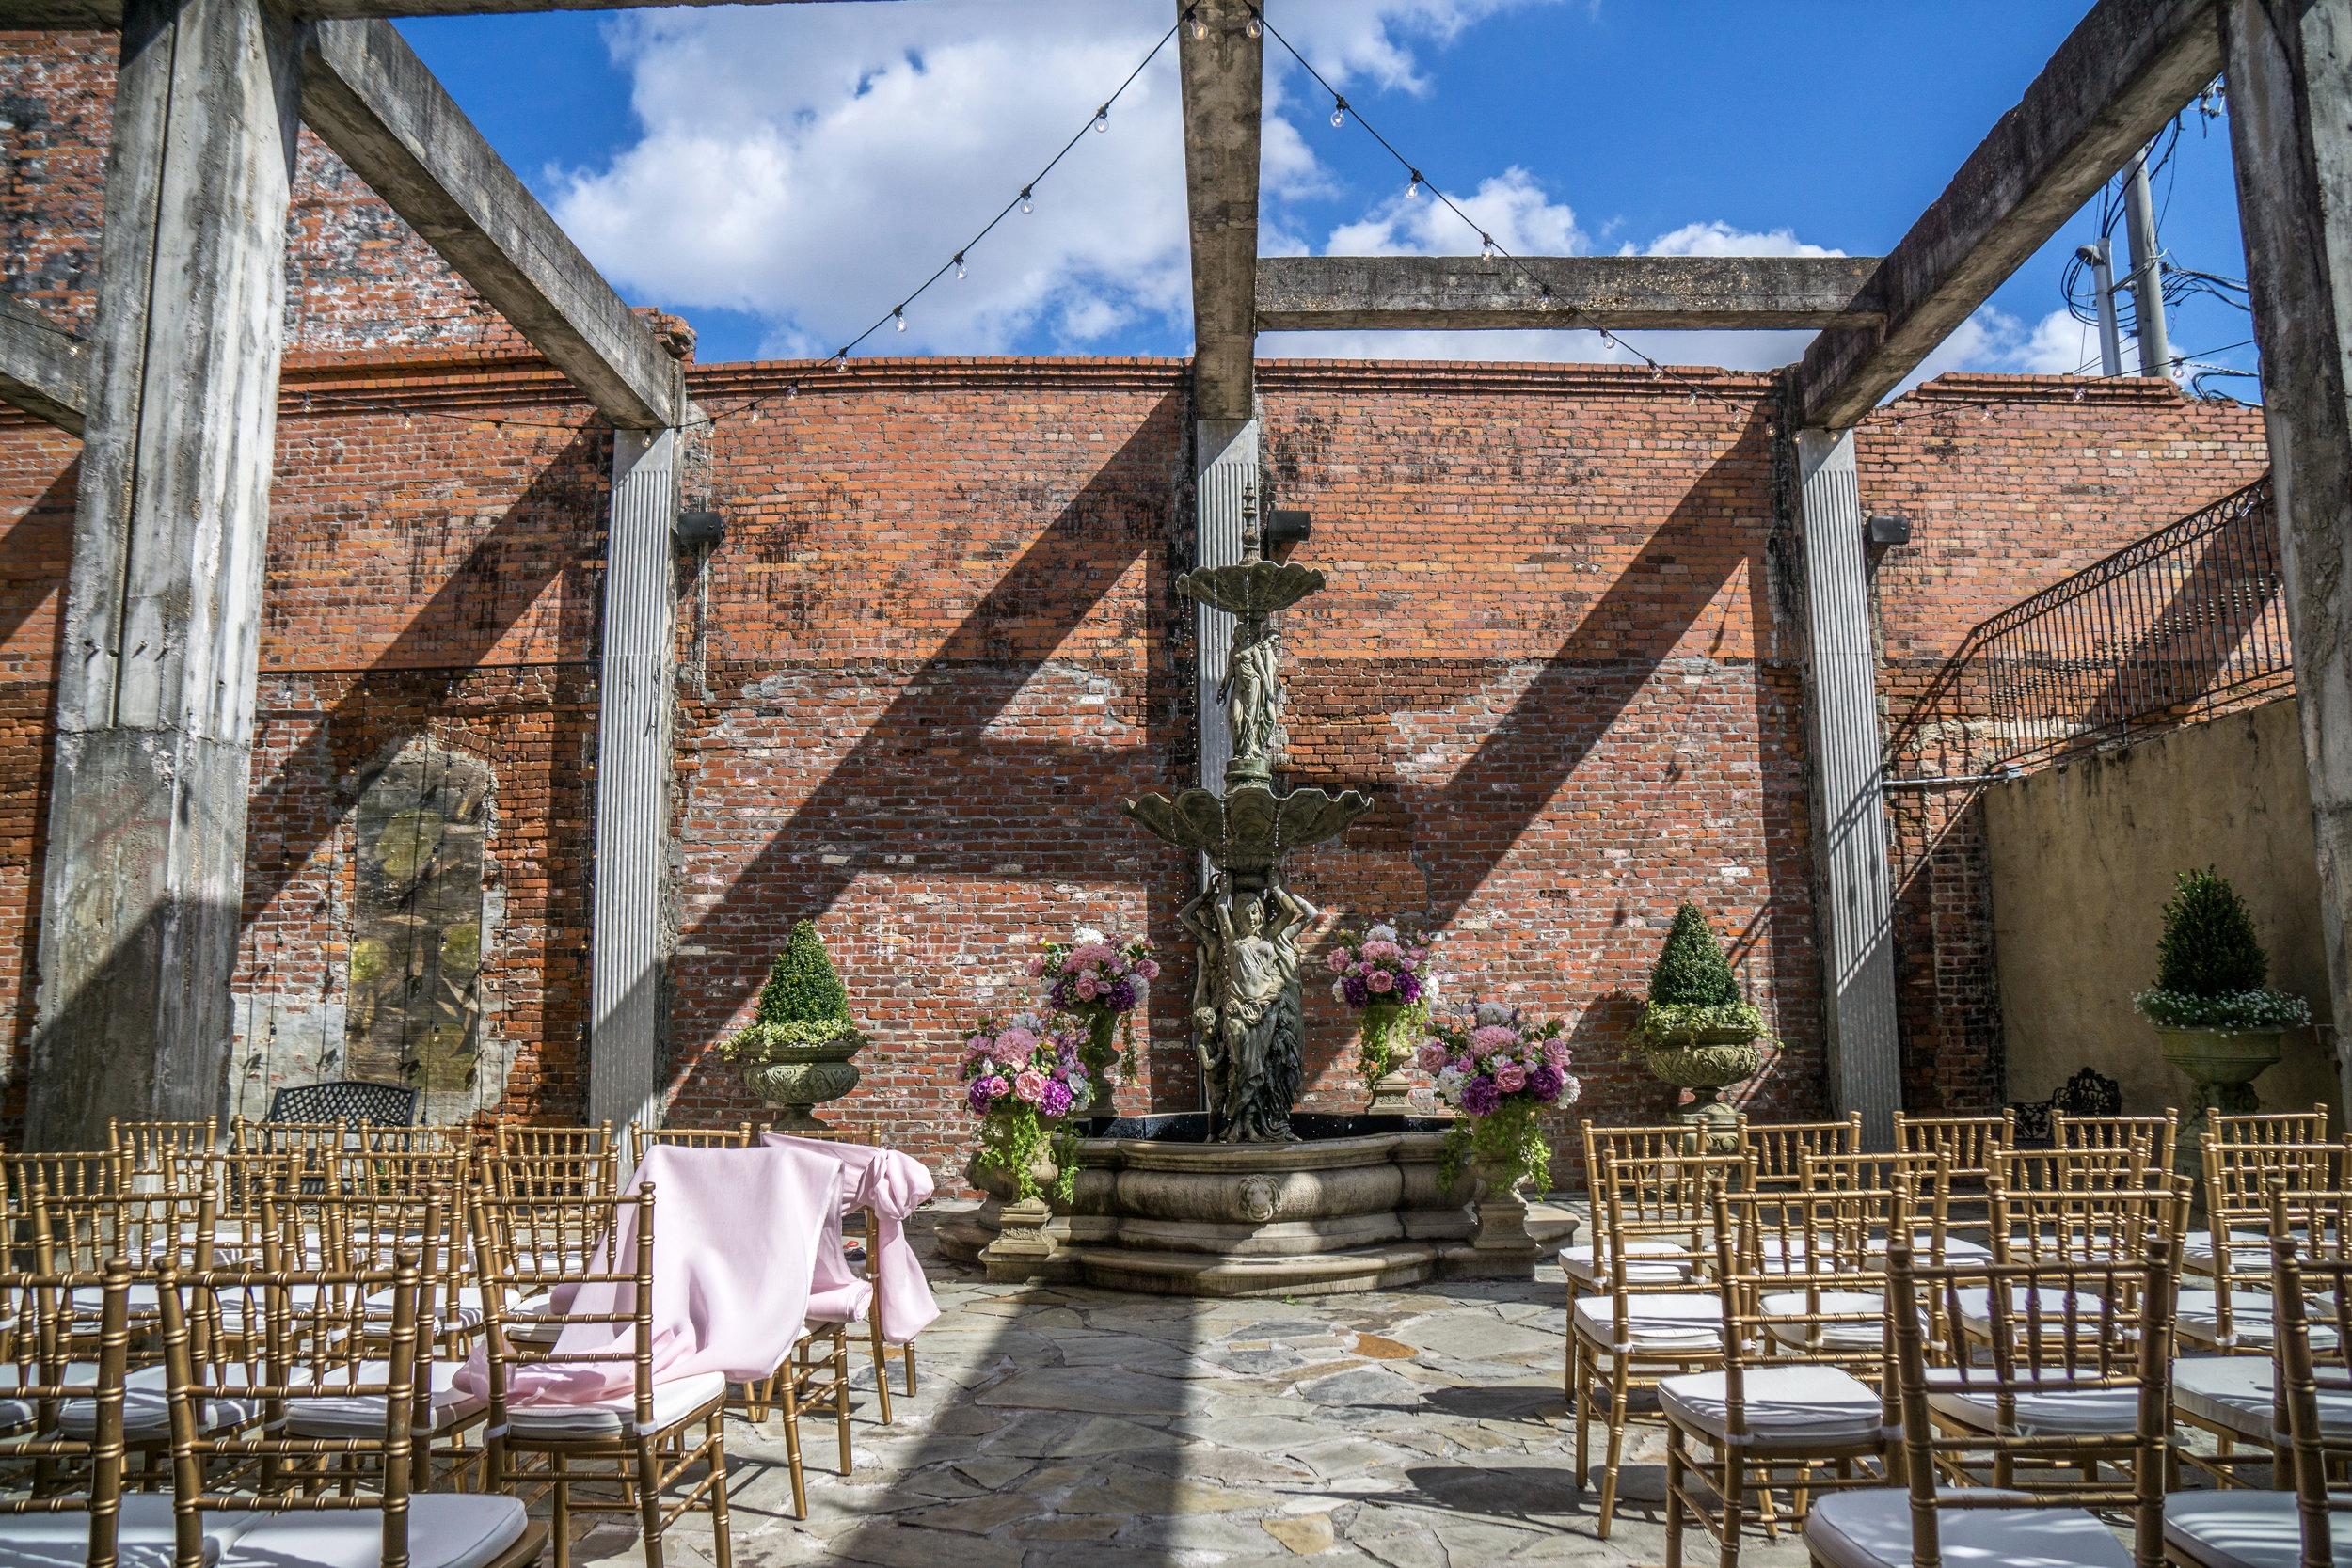 banquet_hall_wedding_venue_outside.jpg